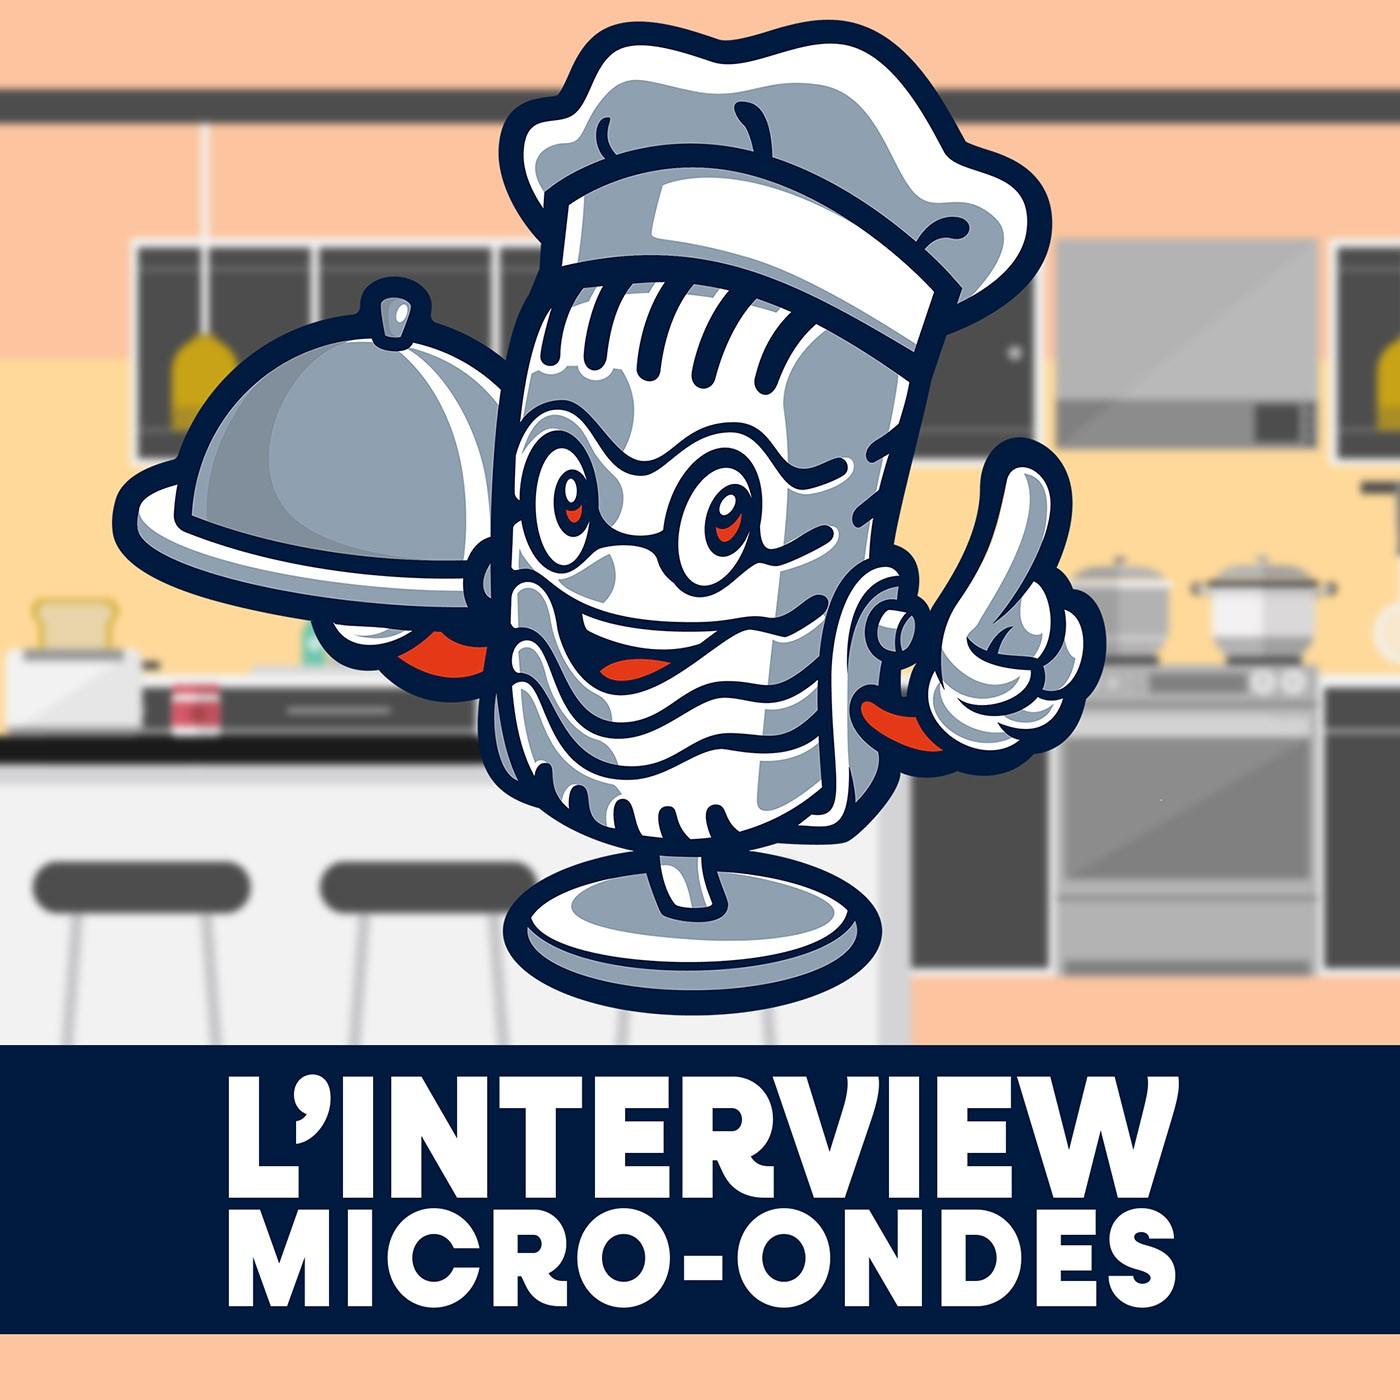 L'Interview Micro-Ondes - André Debus